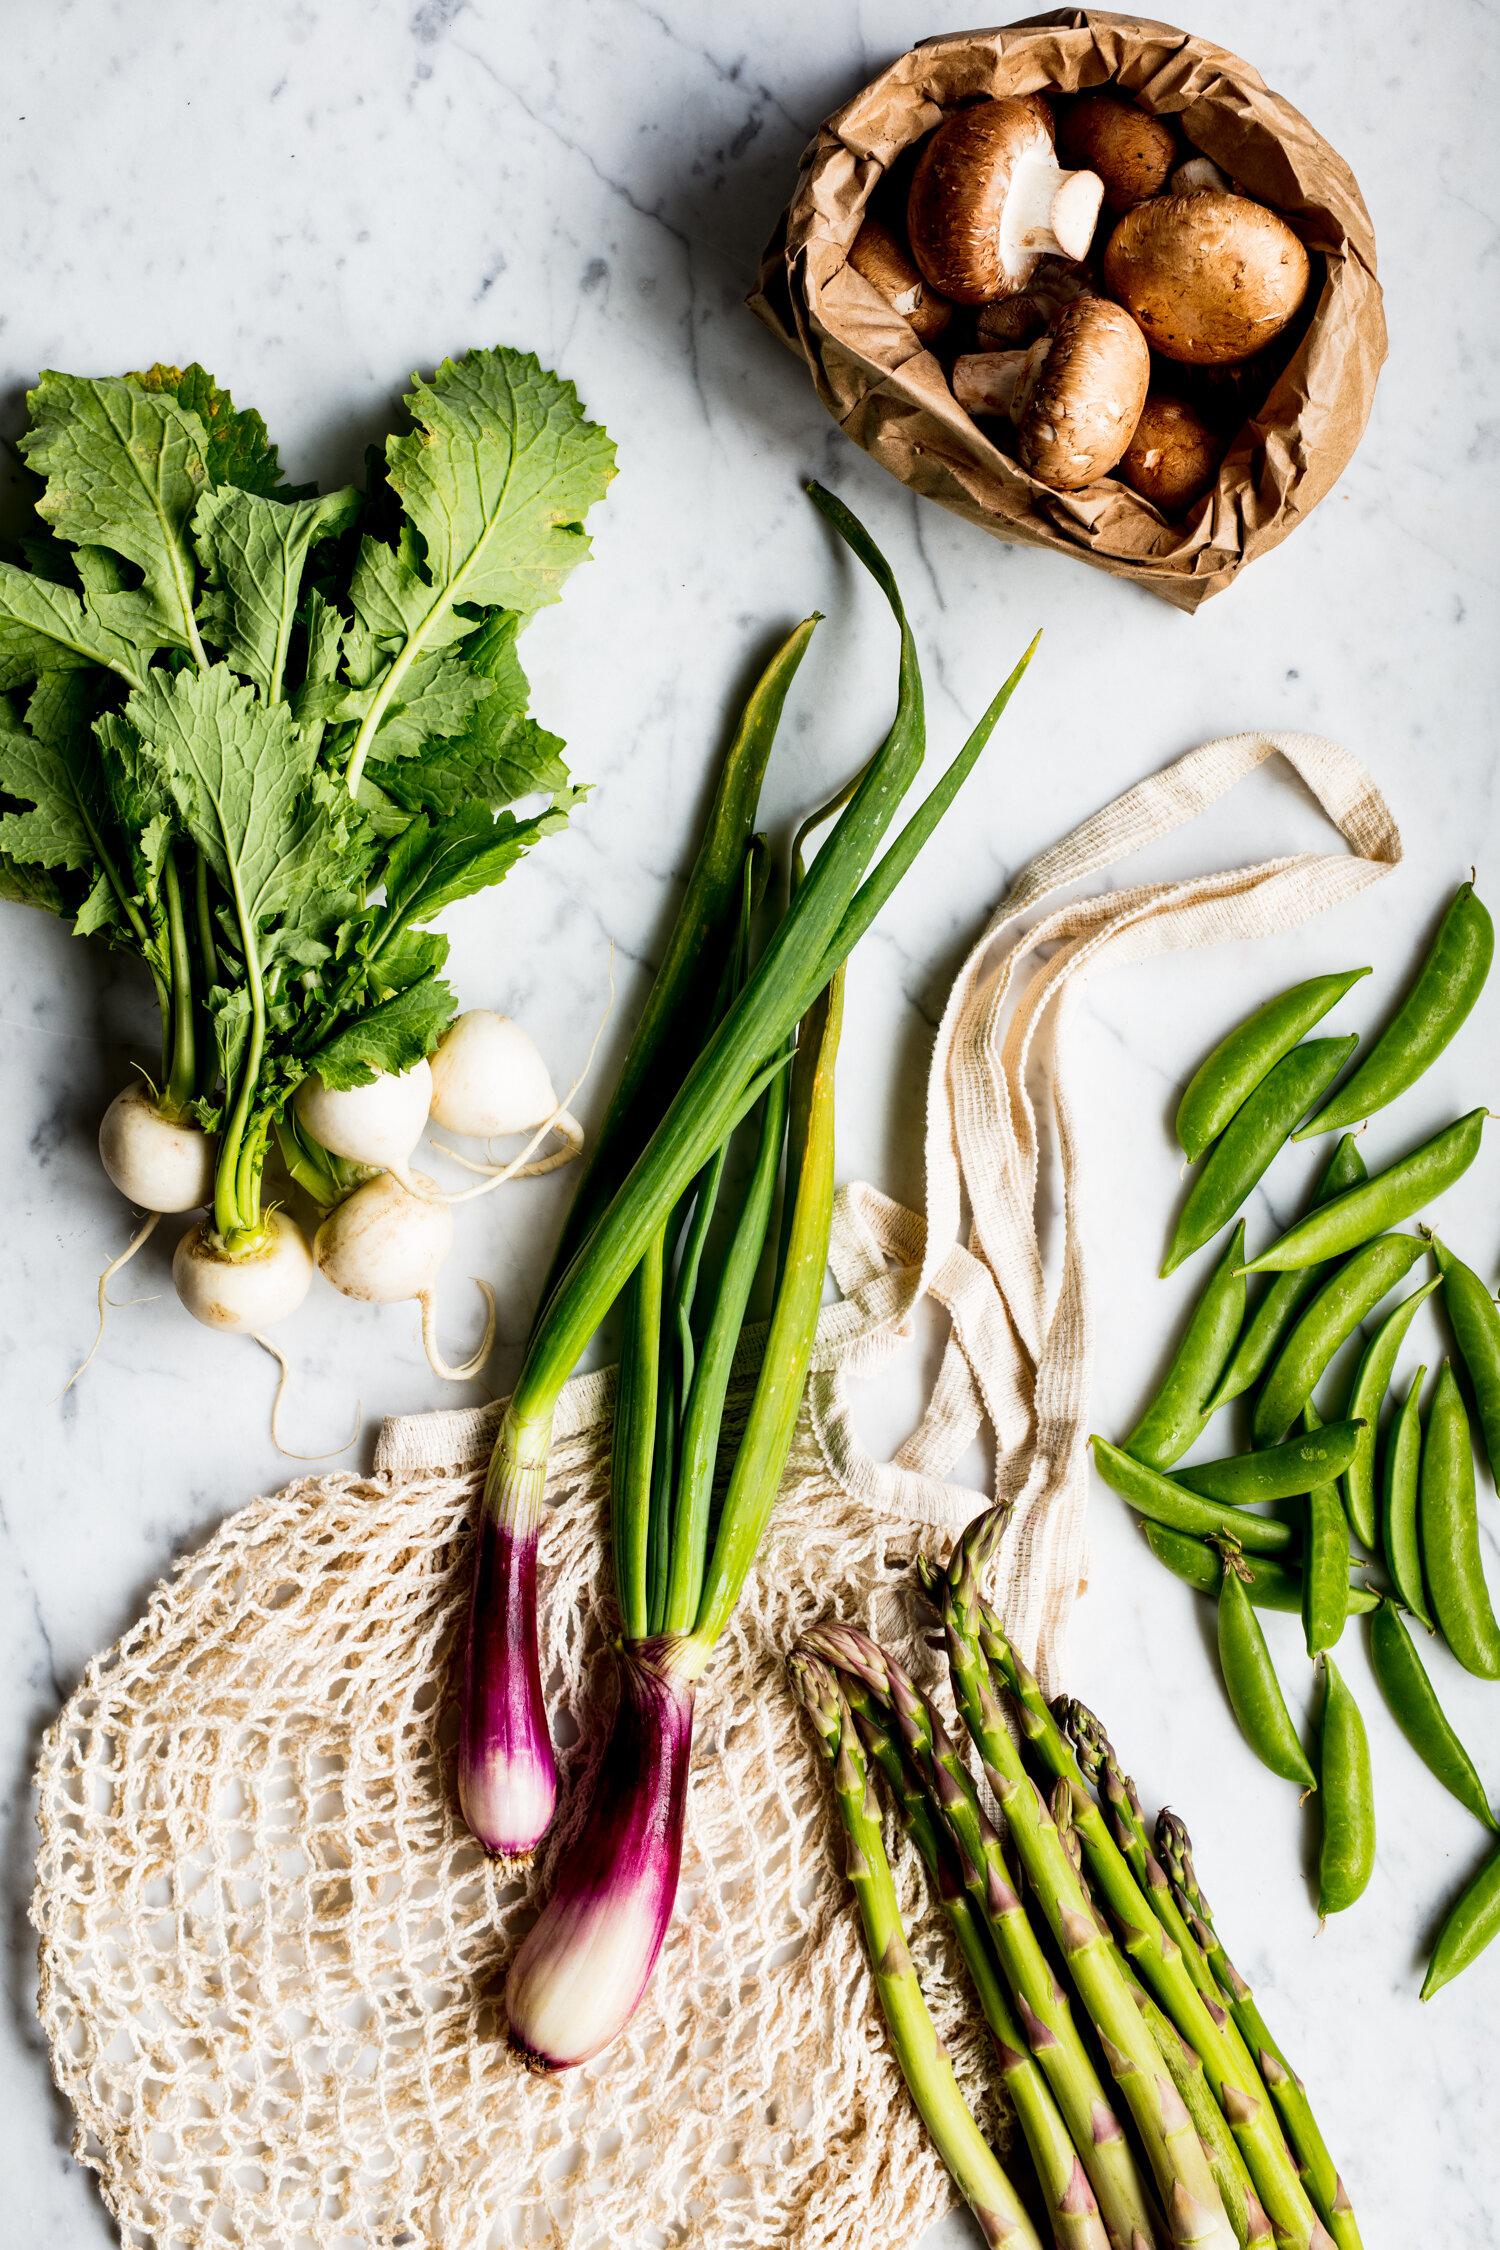 erin-scott-san-francisco-california-natural-light-editorial-food-photographer-edible-communities-farmers-market-veggies-9366.jpg